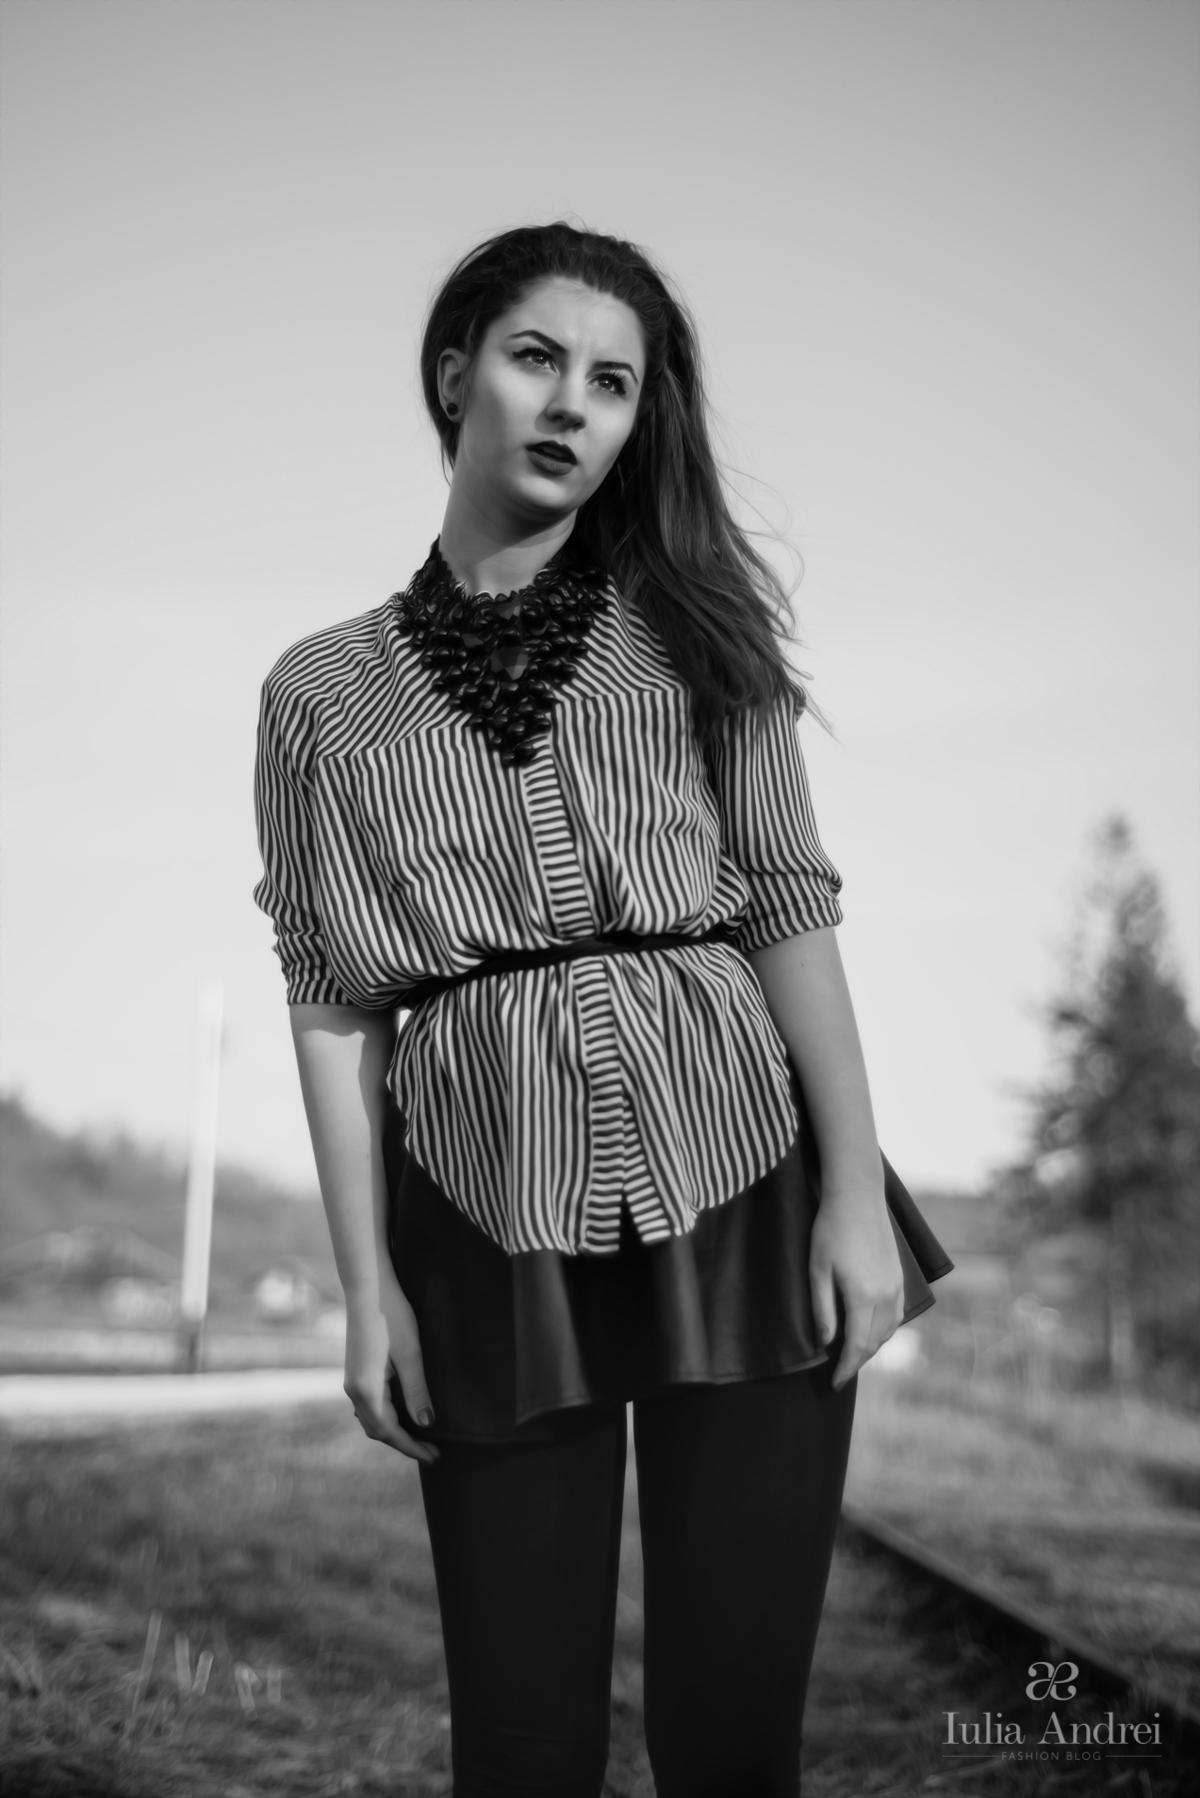 tinuta camasa in dungi alb negru si fusta din piele pliata iulia andrei fashion blog